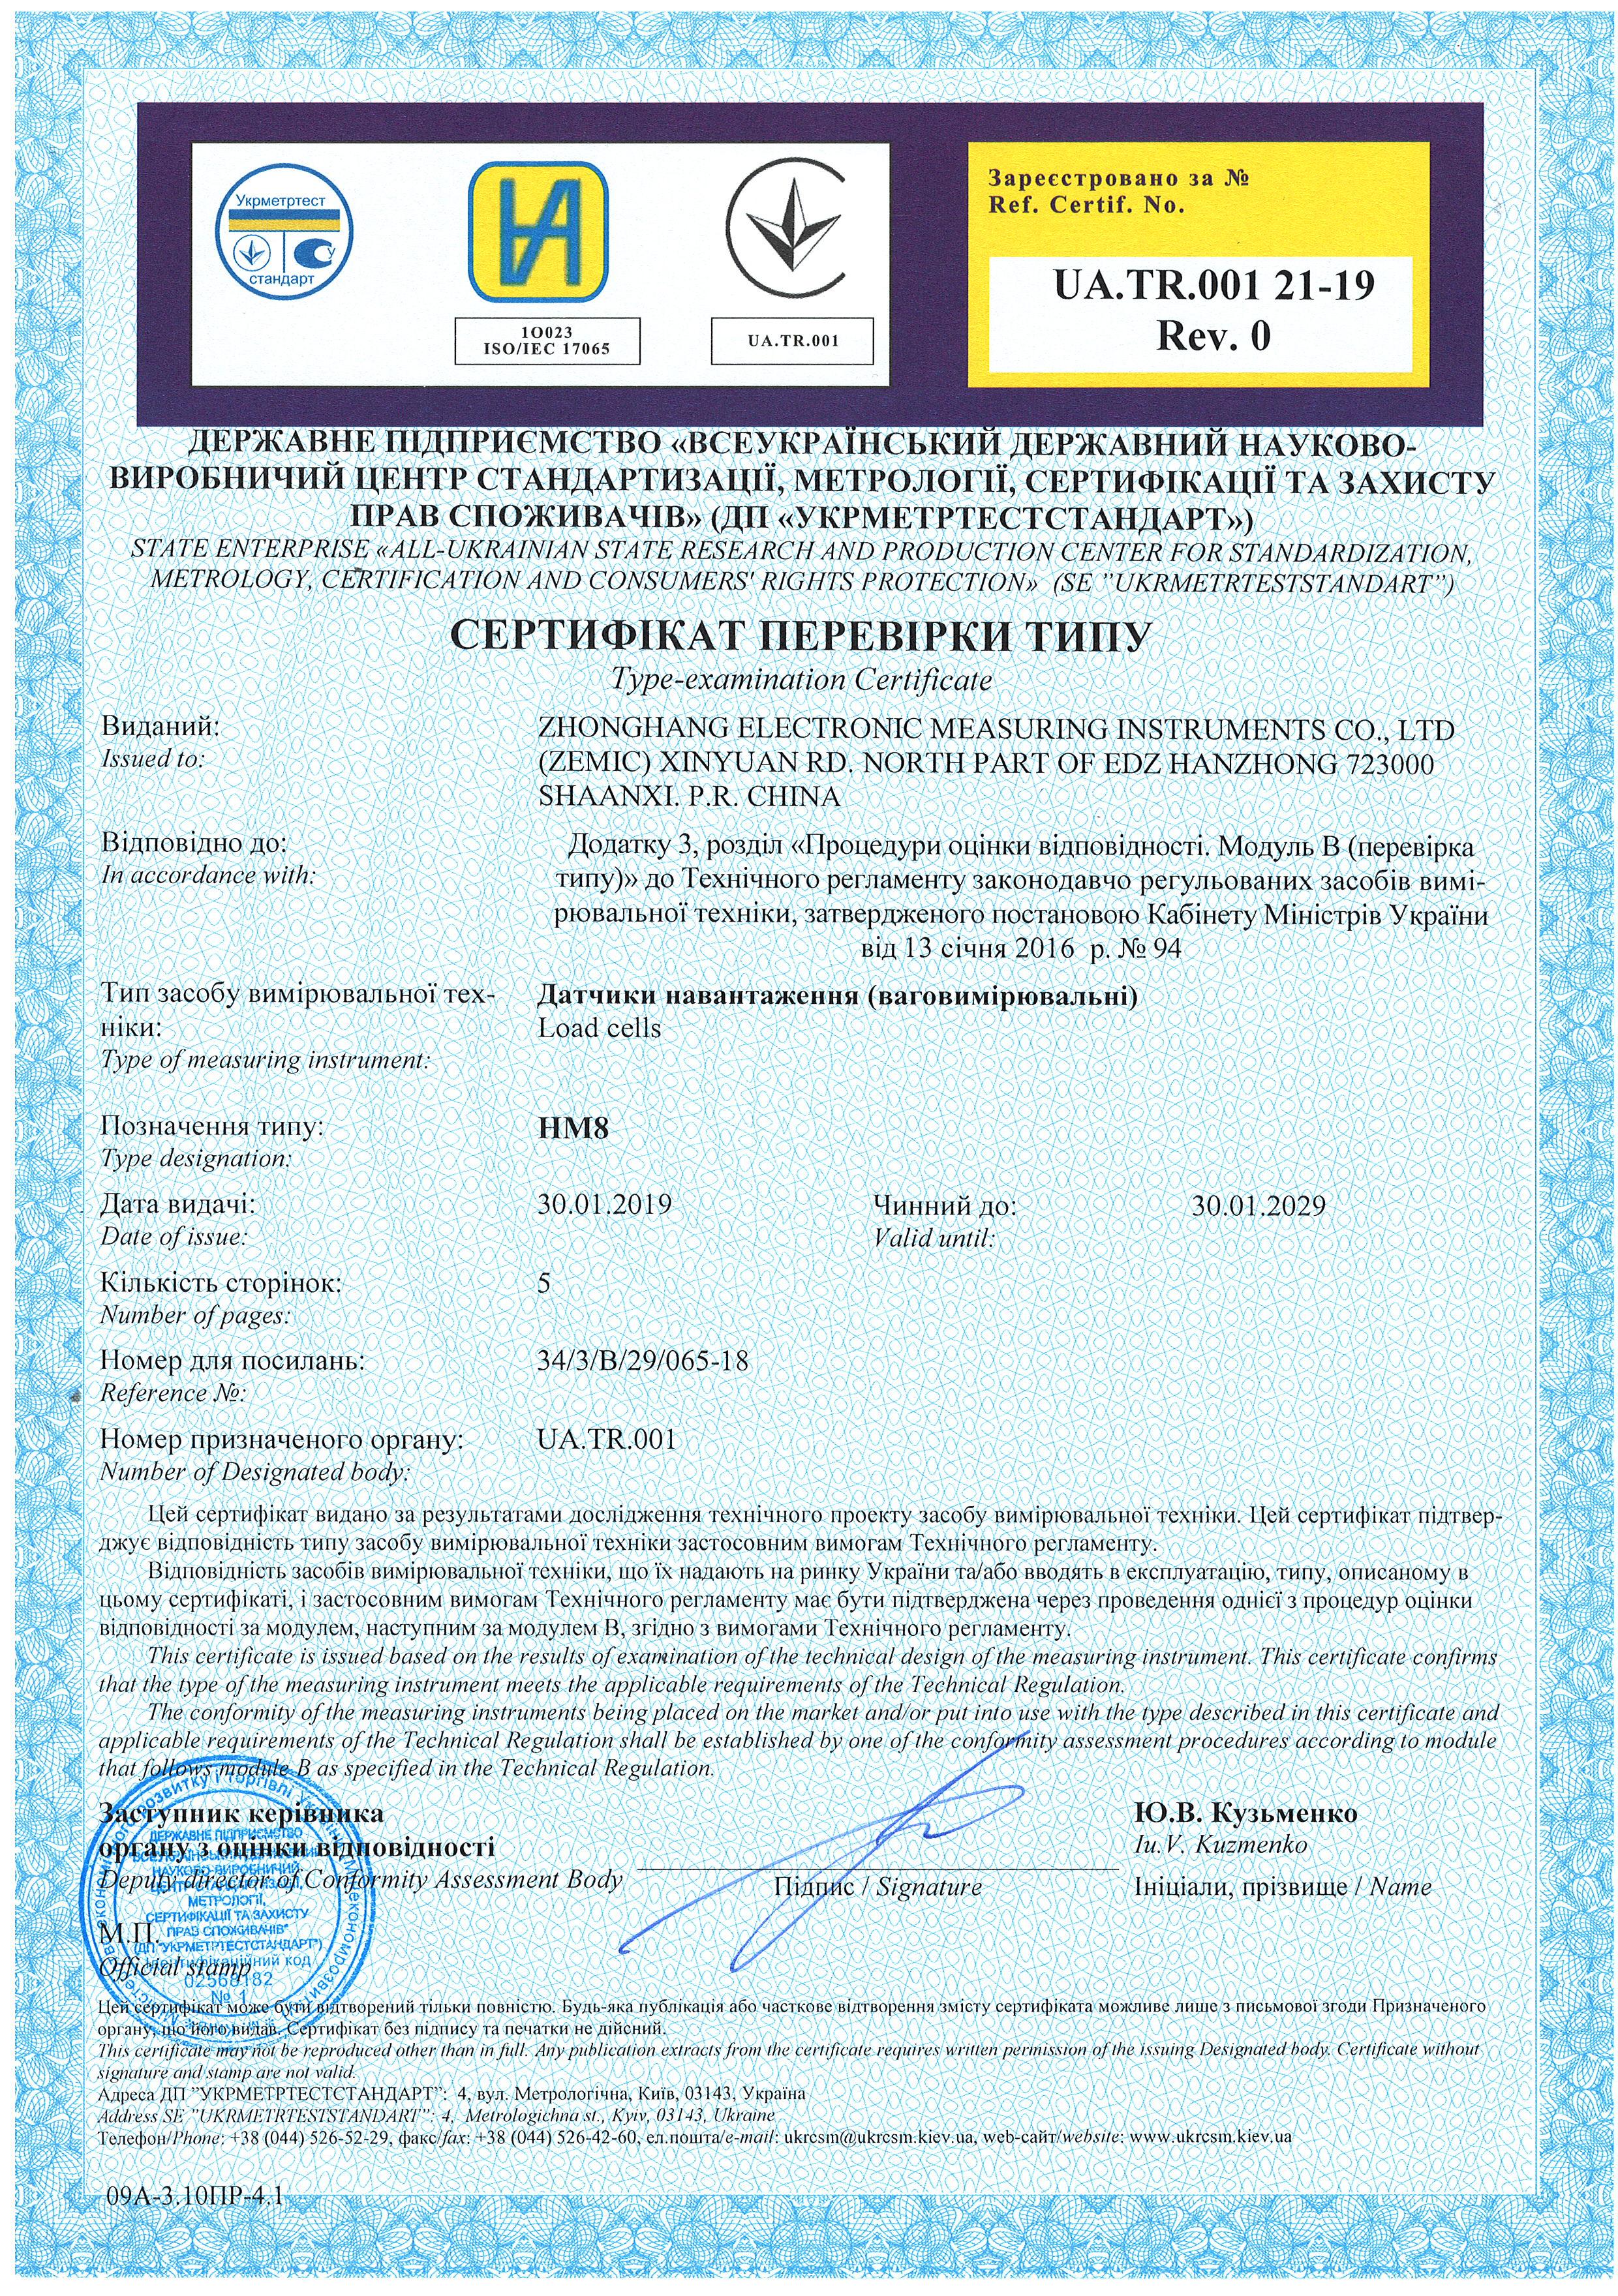 Сертификат Украины ZEMIC  тип модели НМ8